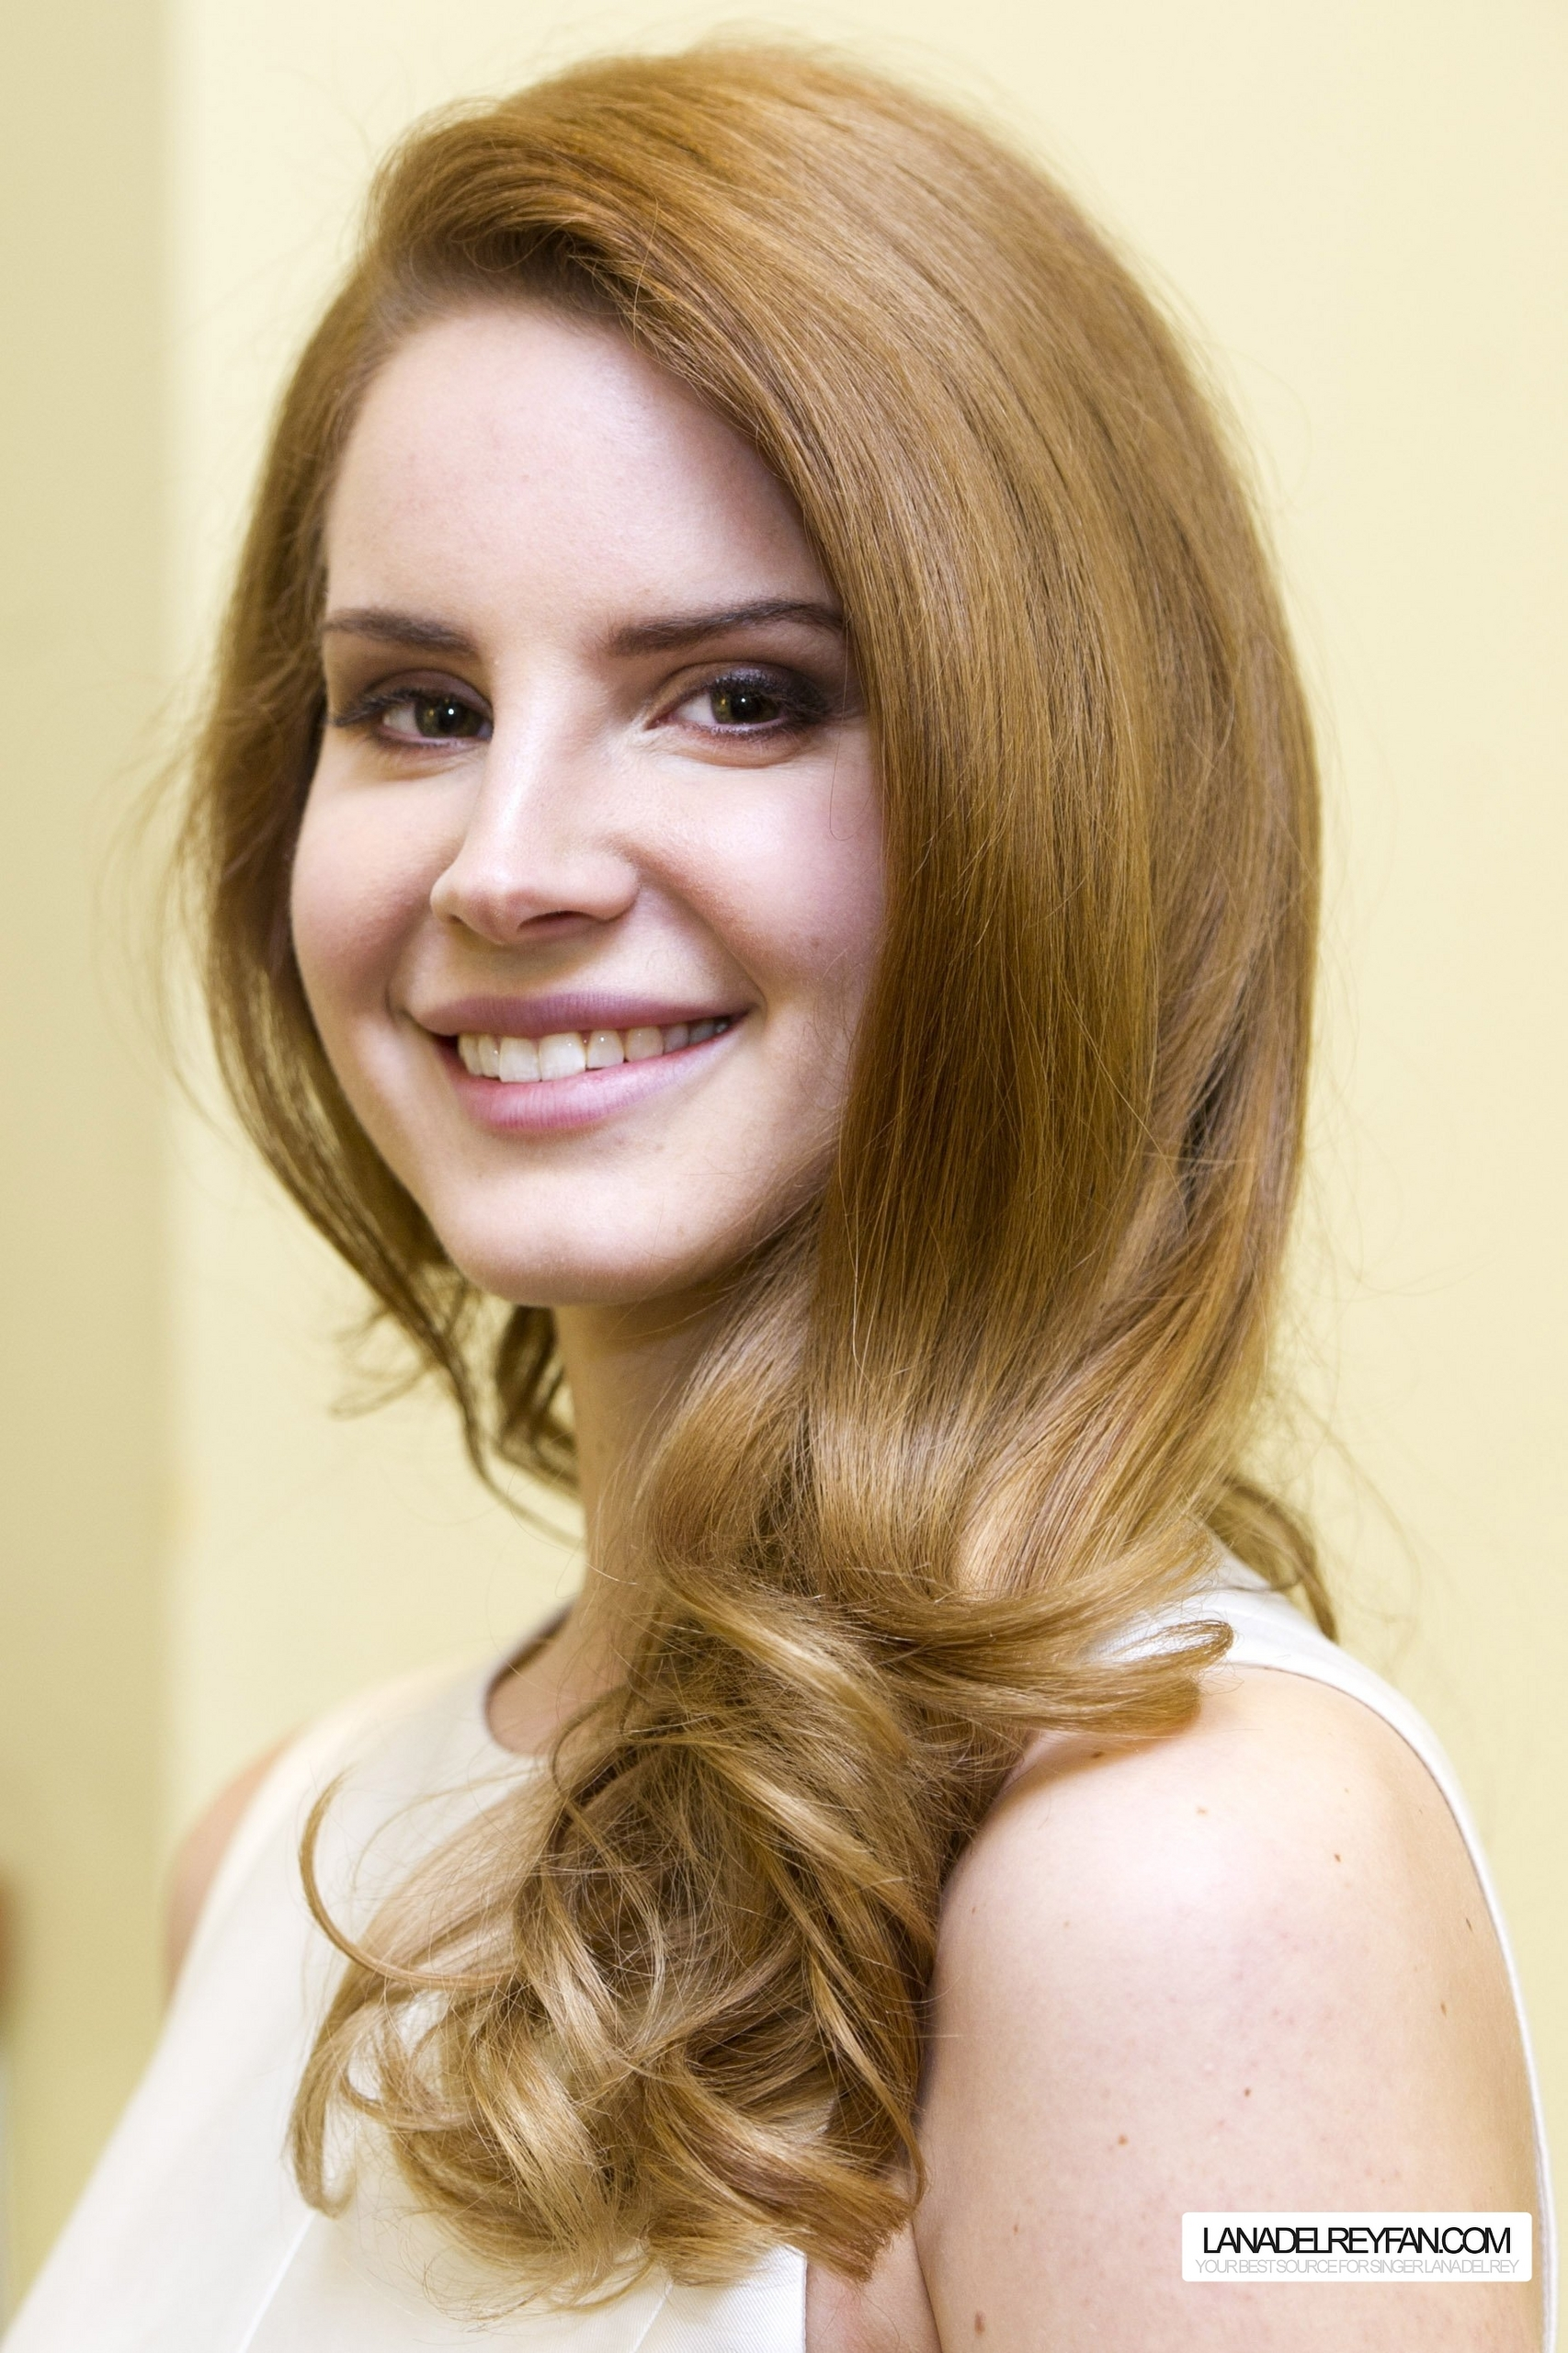 Lana Del Rey Portraits kwa Charles Sykes